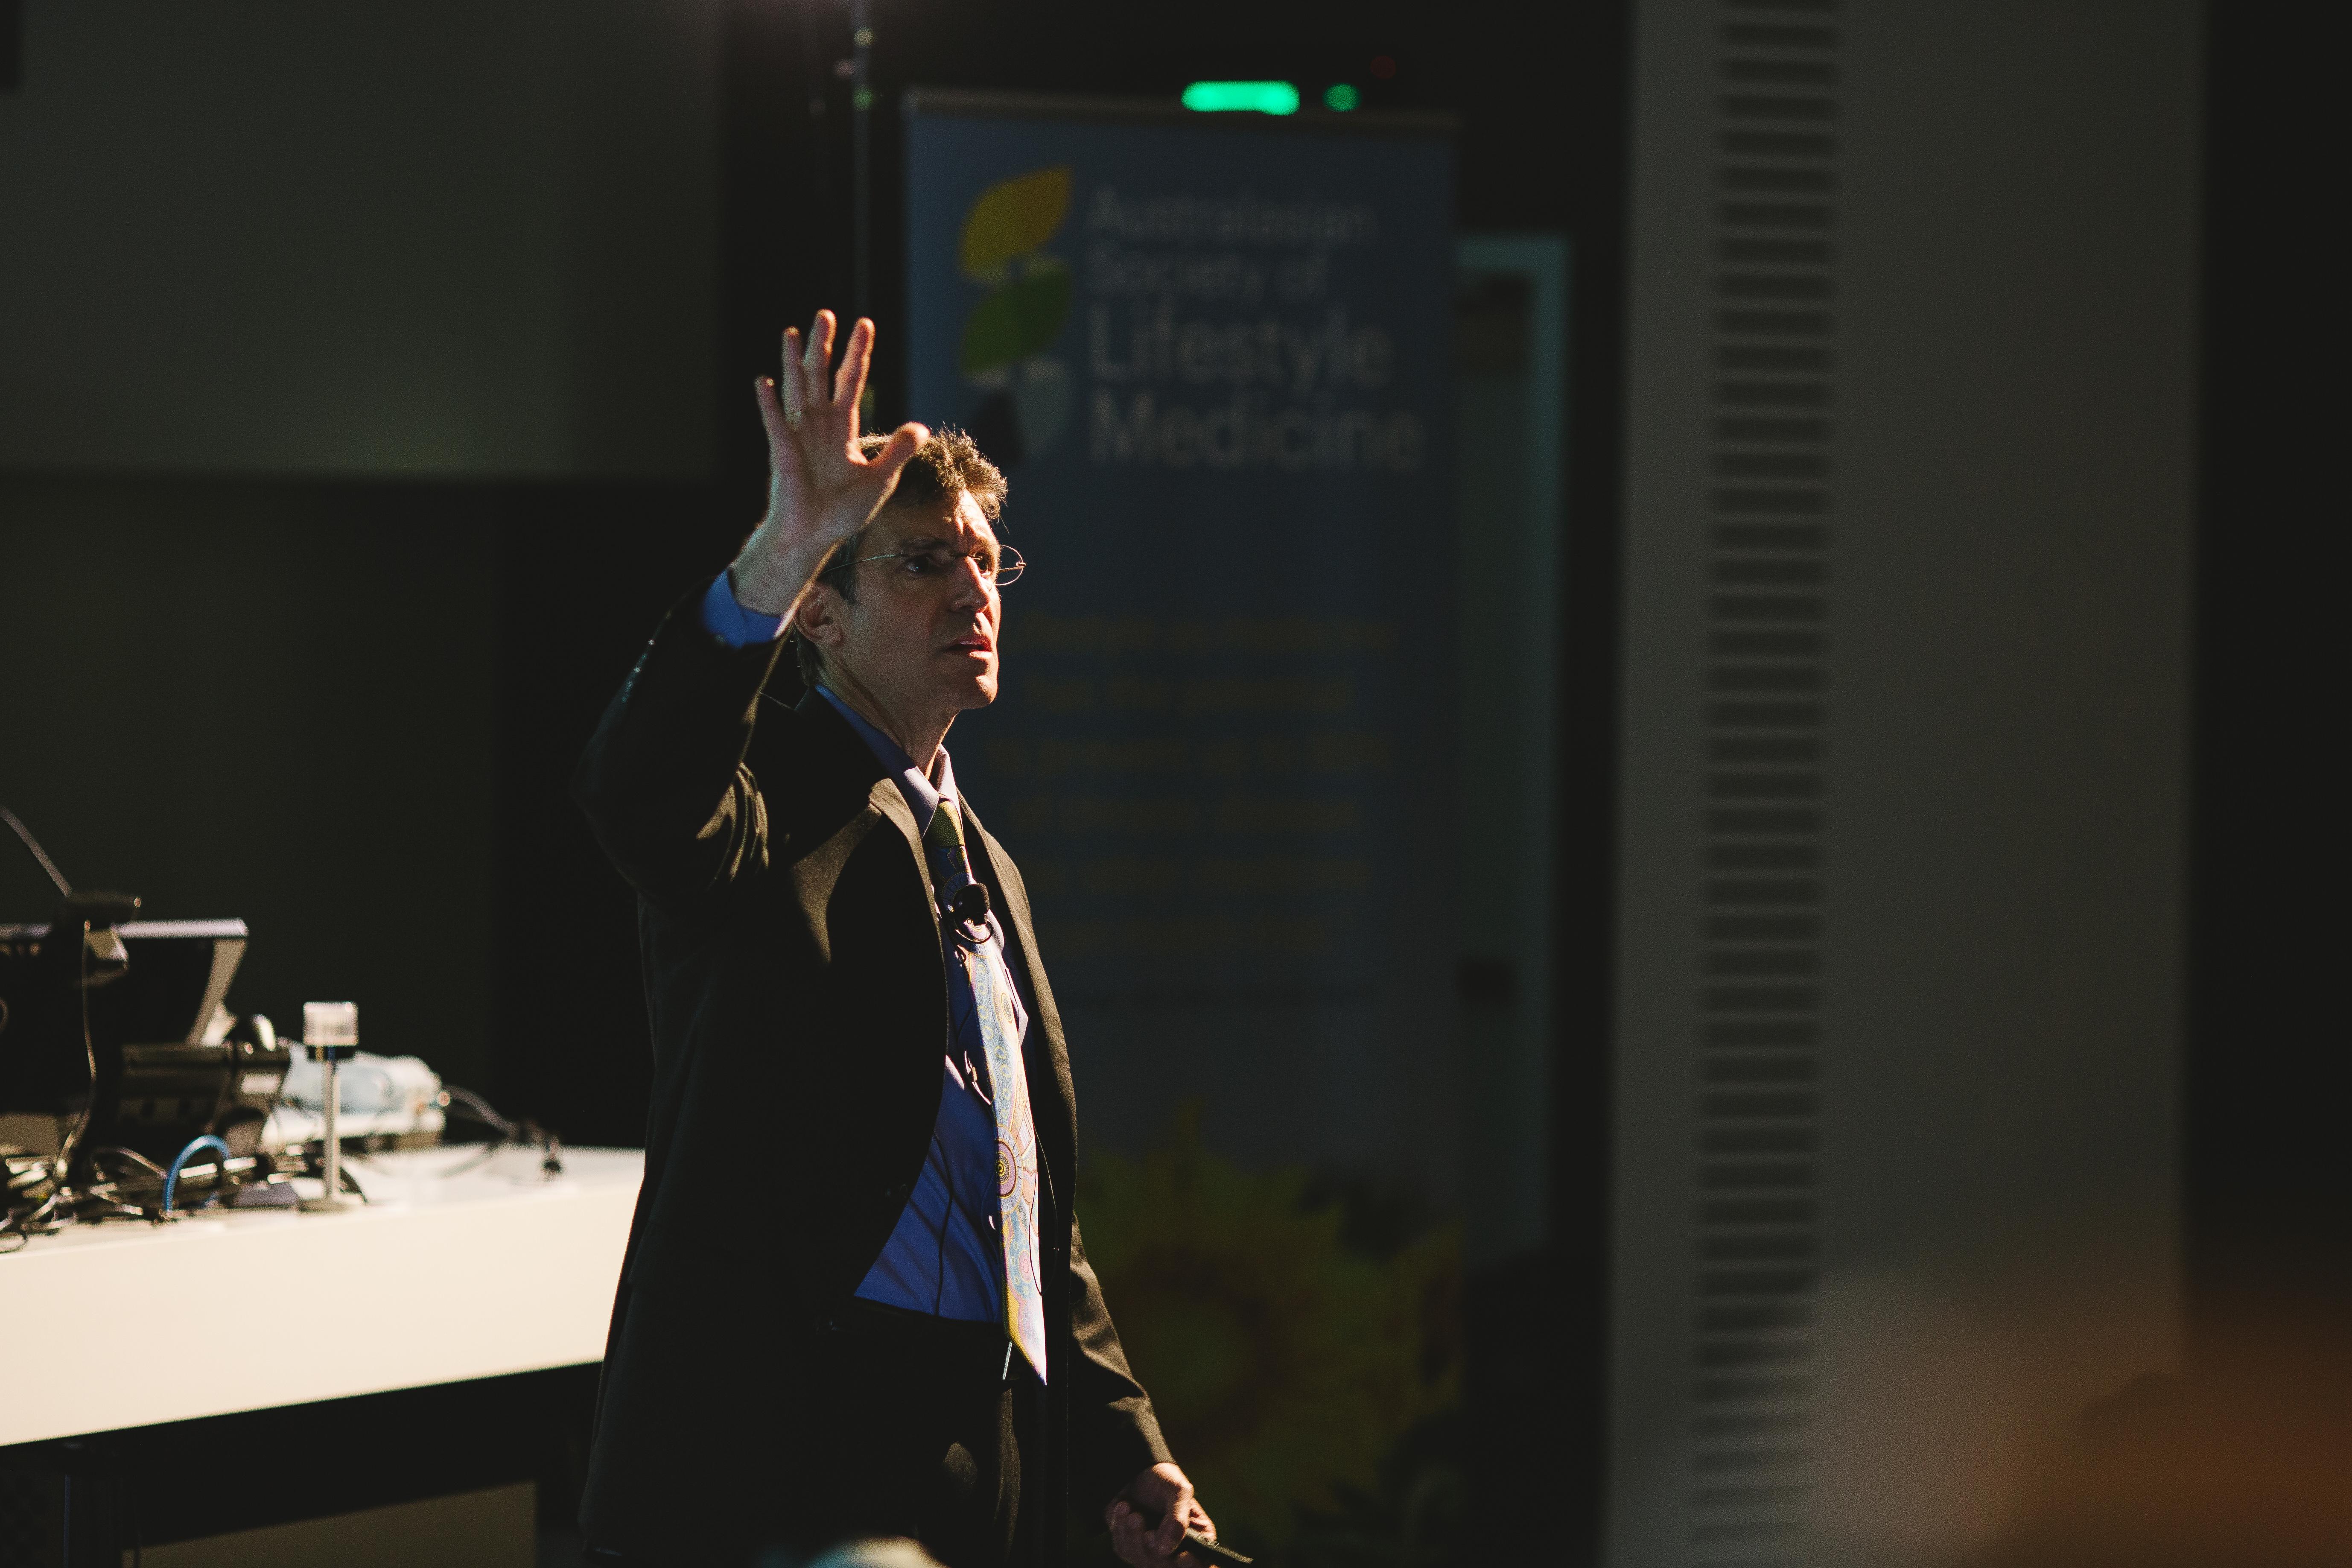 DR DAVID KATZ AUSTRALASIAN LIFESTYLE MEDICINE